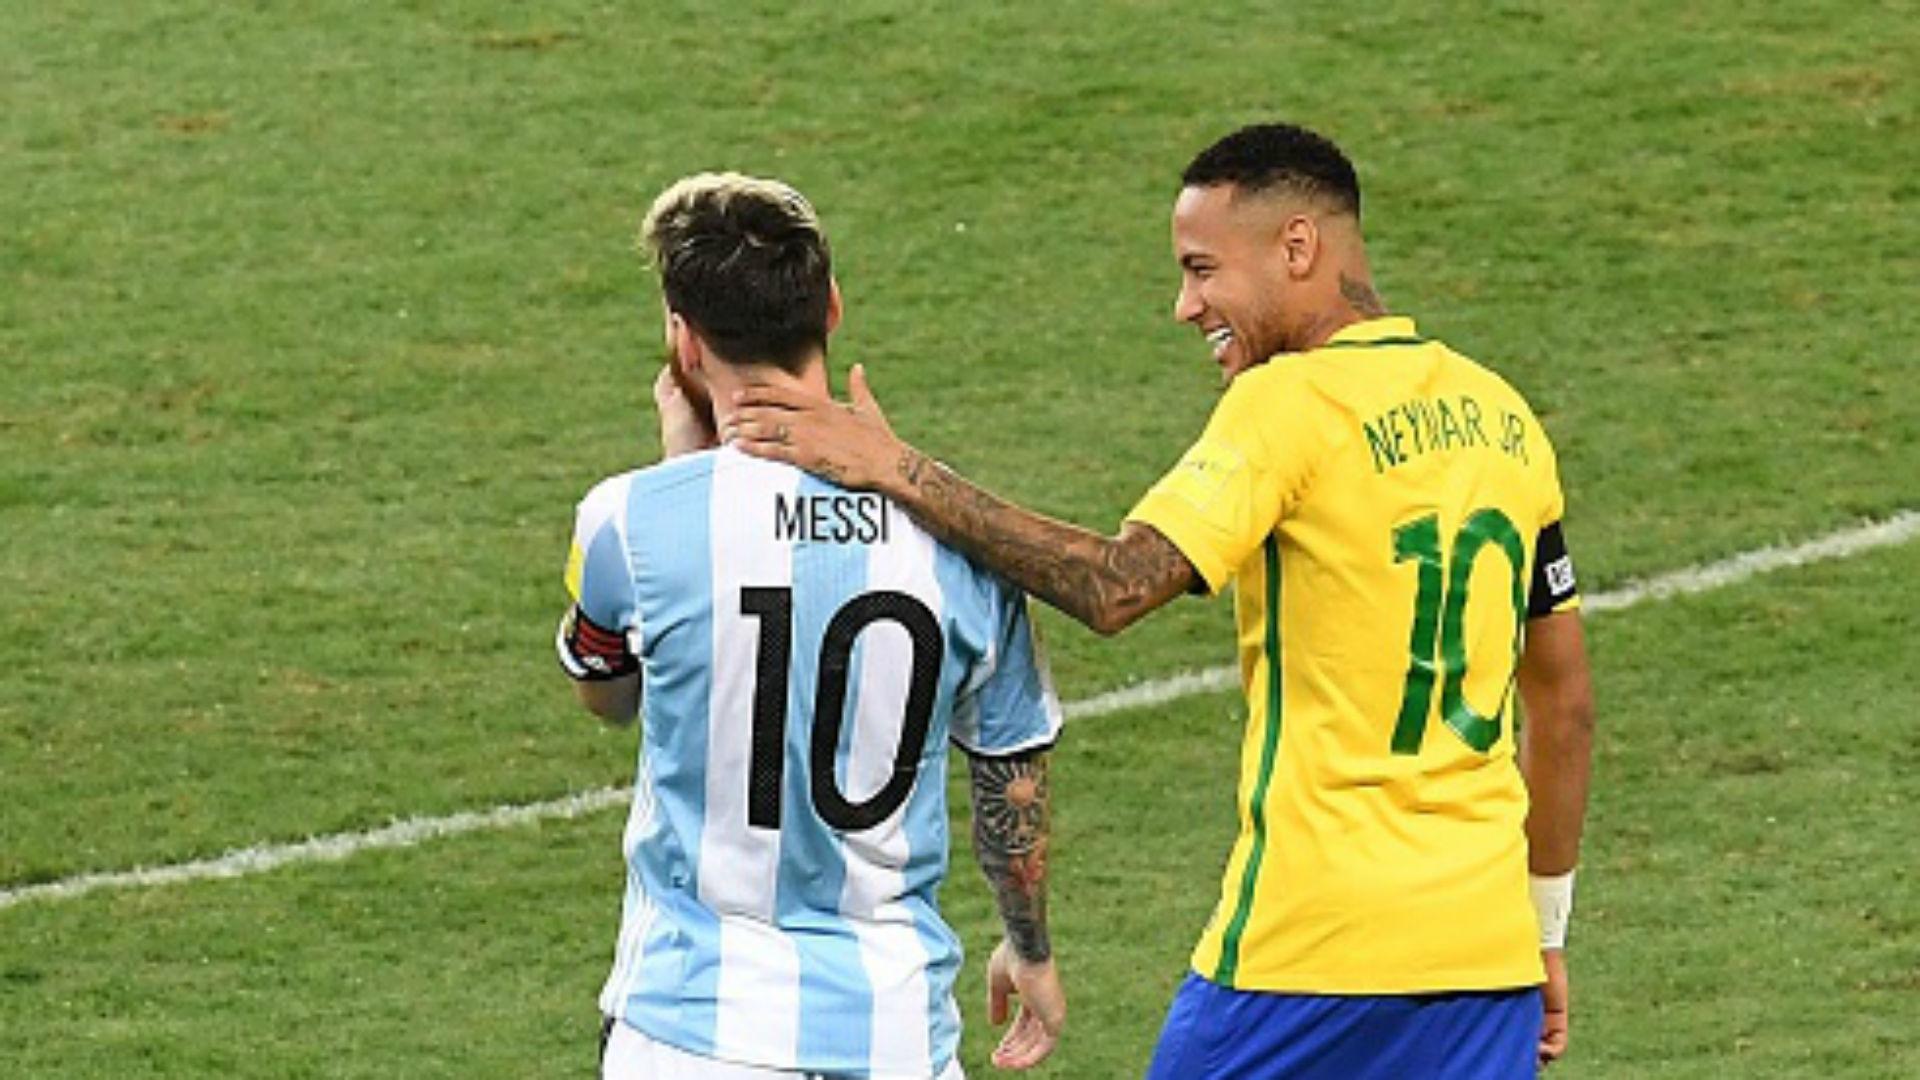 Brasil Argentina Eliminatorias CONMEBOL Rusia 2018 Mineirao 10112016 Lionel Messi Neymar Jr.